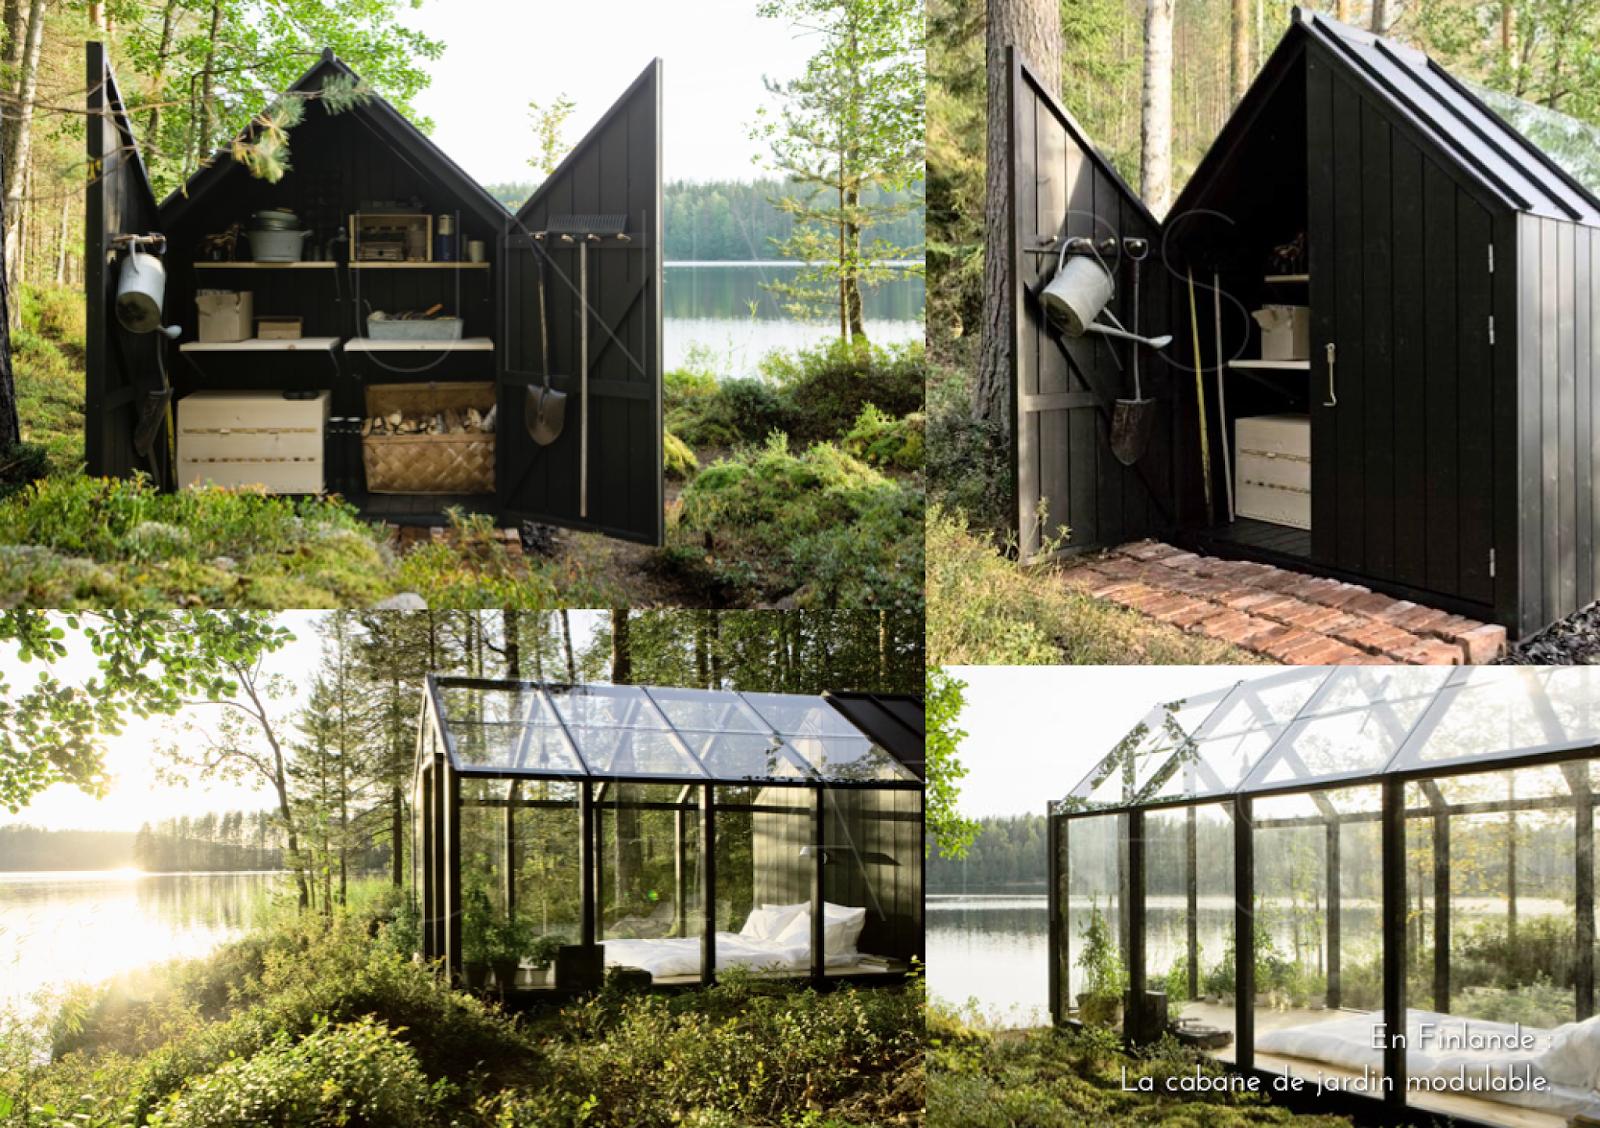 En Finlande : La Cabane De Jardin Modulable.   Cabane Jardin ... tout Abri De Jardin Finlandais